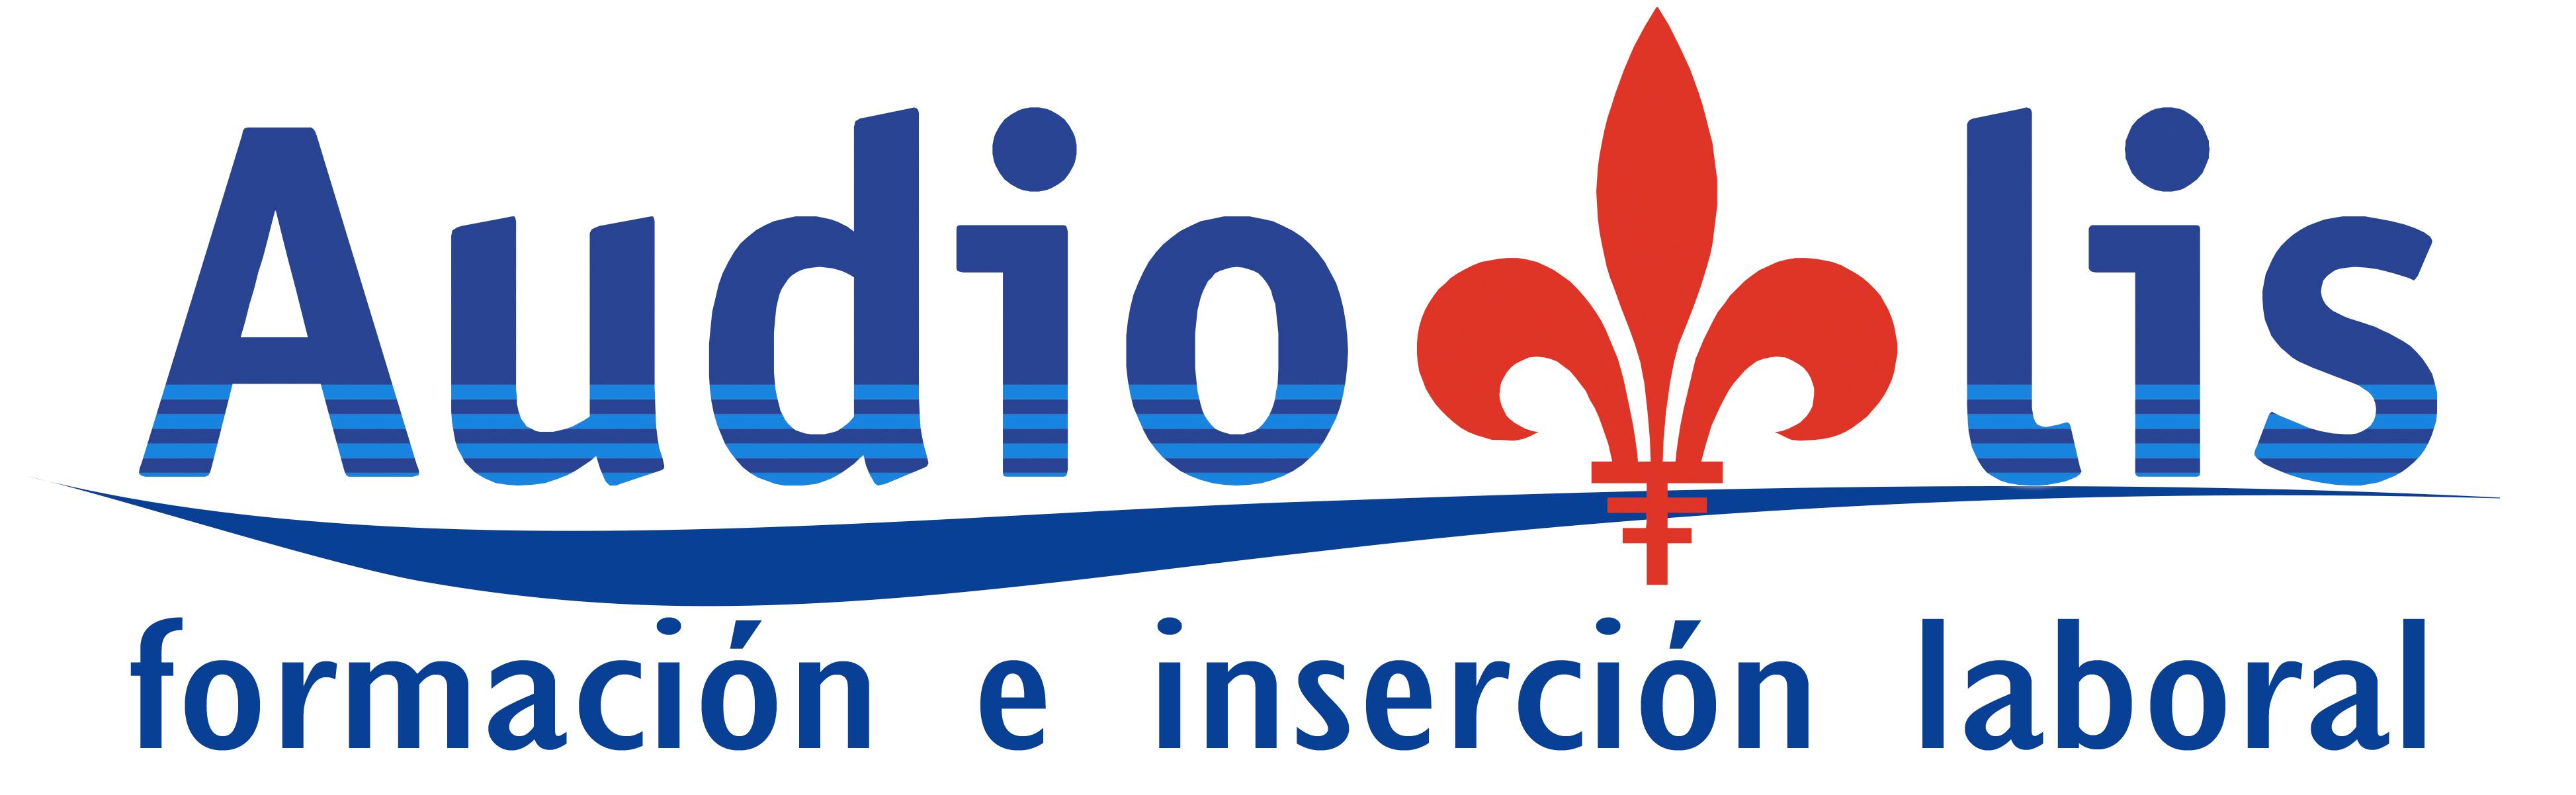 Logo delAudiolis